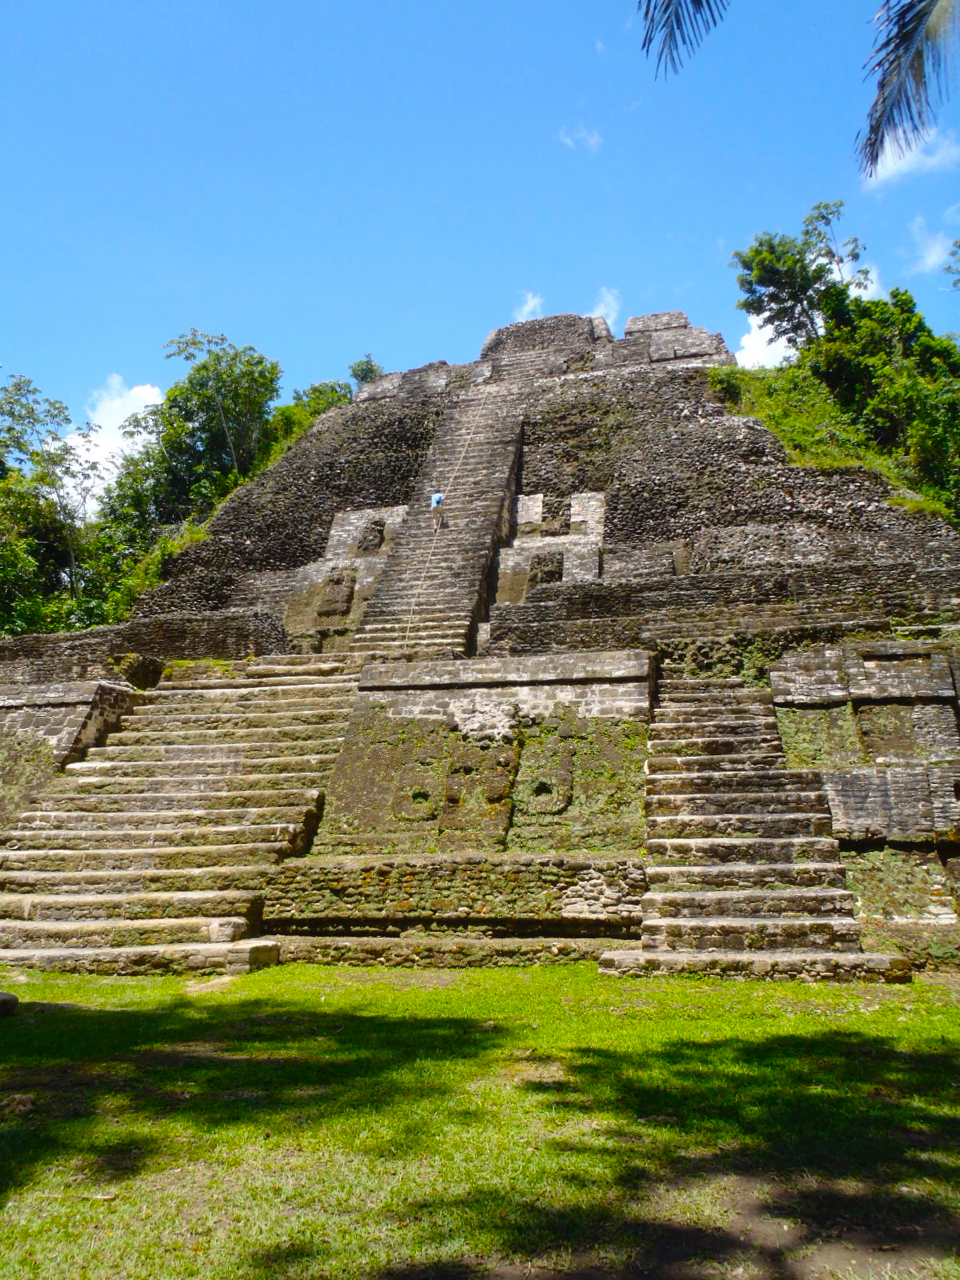 Belize Mainland Tour Lamani Pictures - 57 of 64